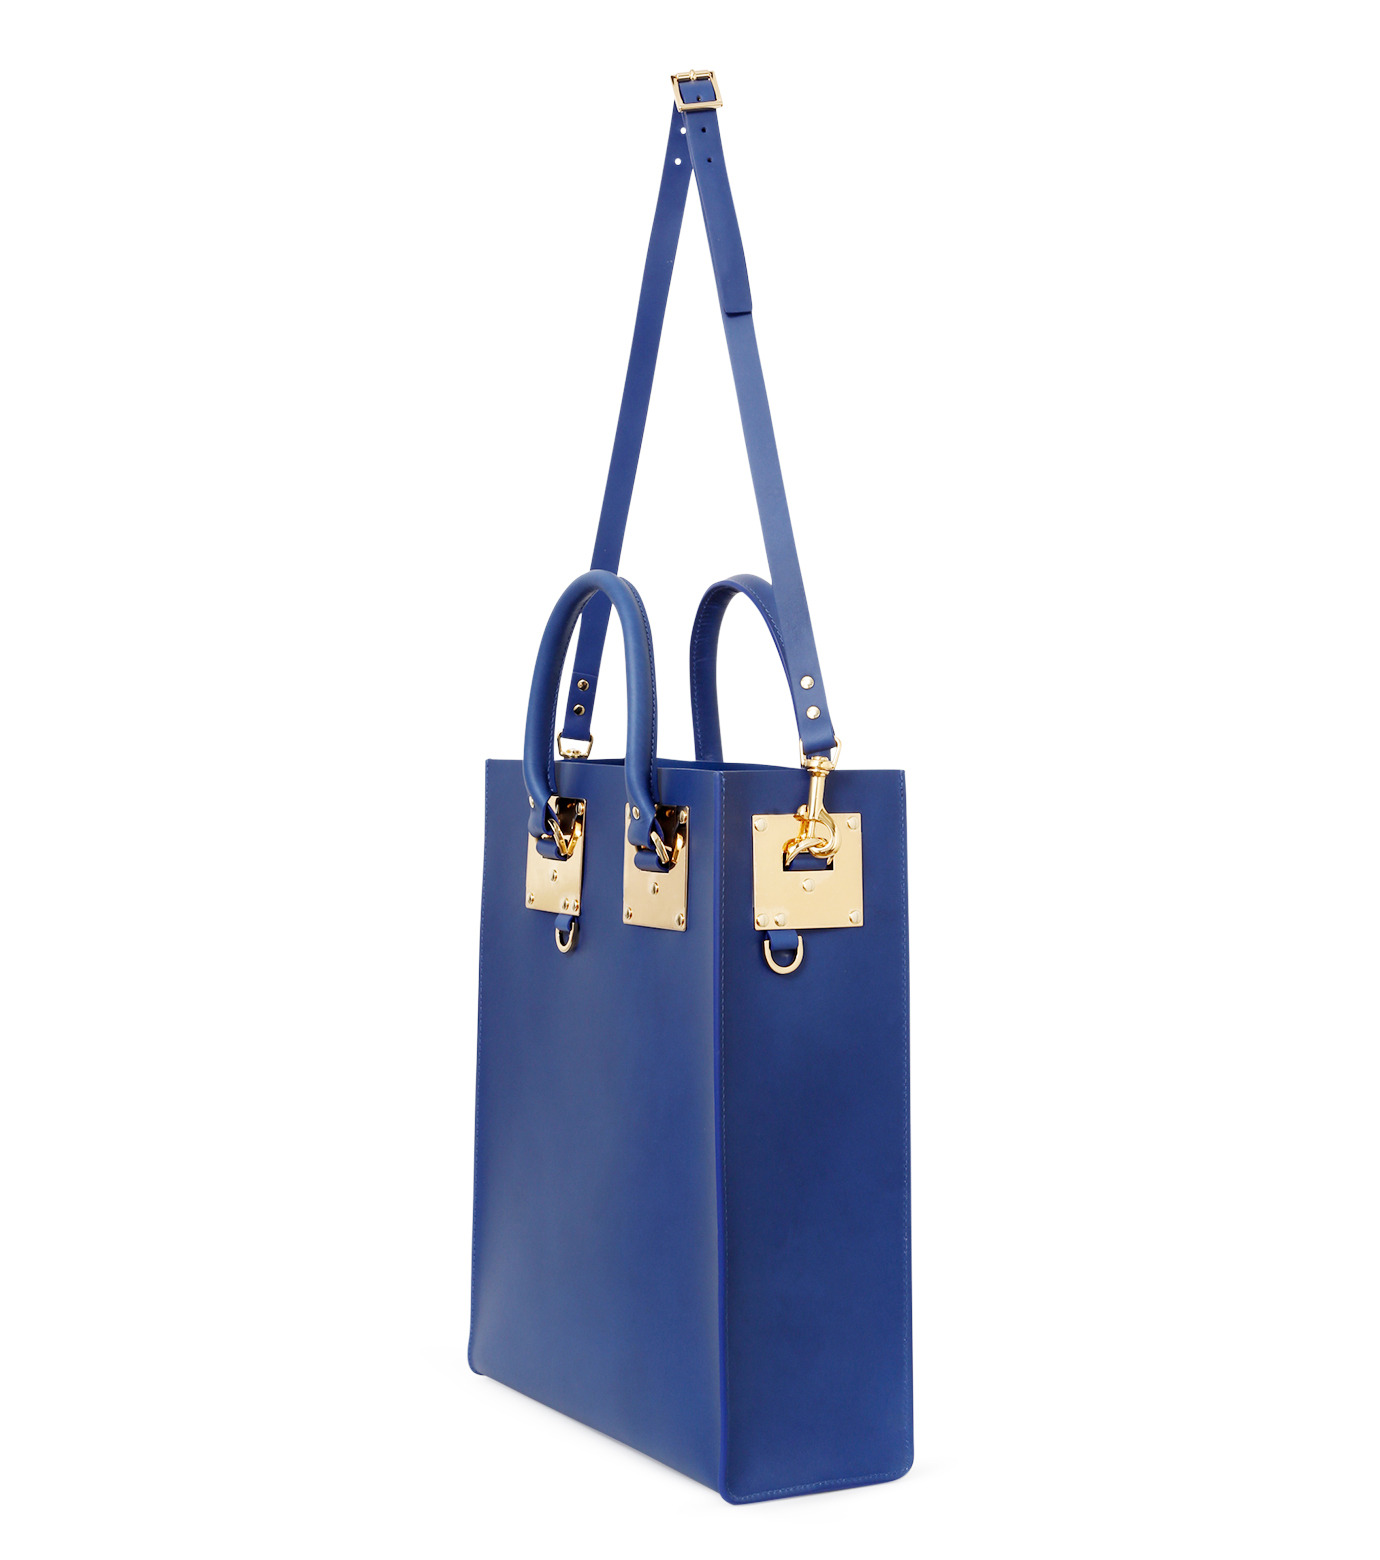 Sophie Hulme(ソフィーヒュルム)のLarge Tote Bag-BLUE(バッグ/bag)-BG047LE-L-92 拡大詳細画像3